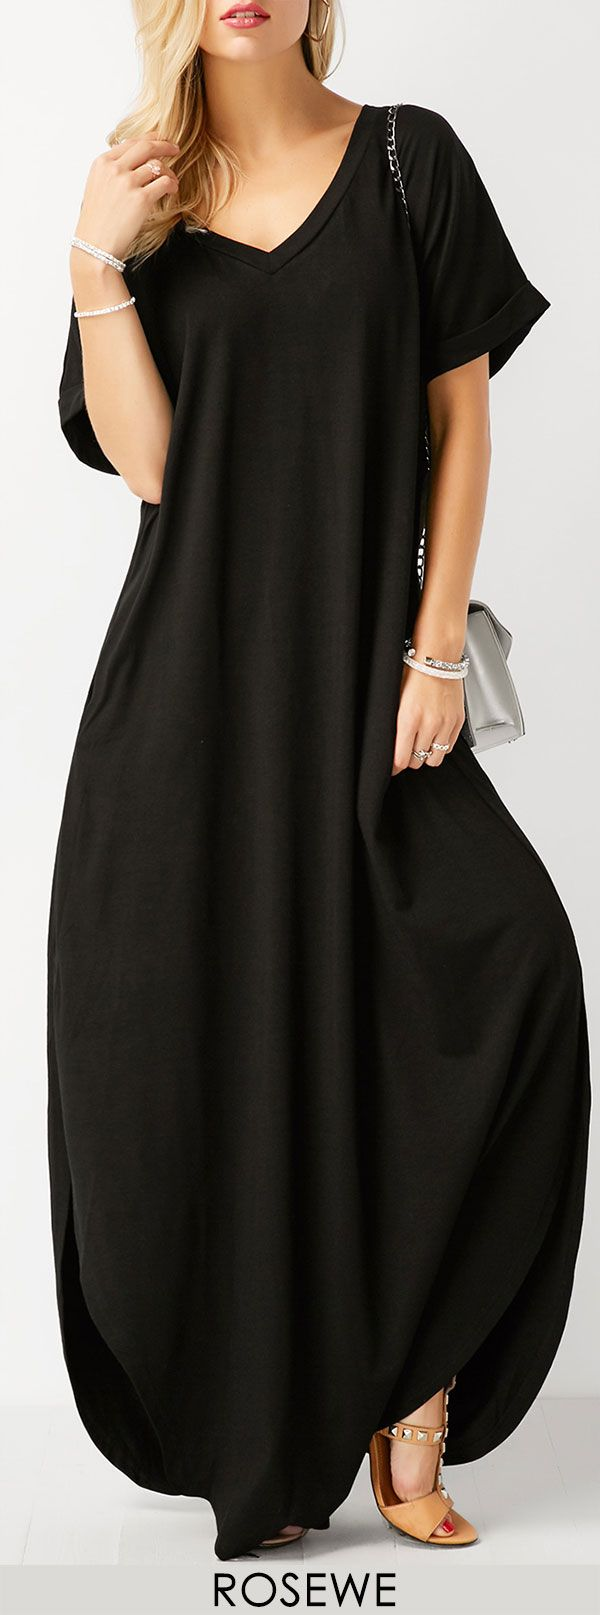 Short sleeve black side slit maxi dress pinterest side slit maxi